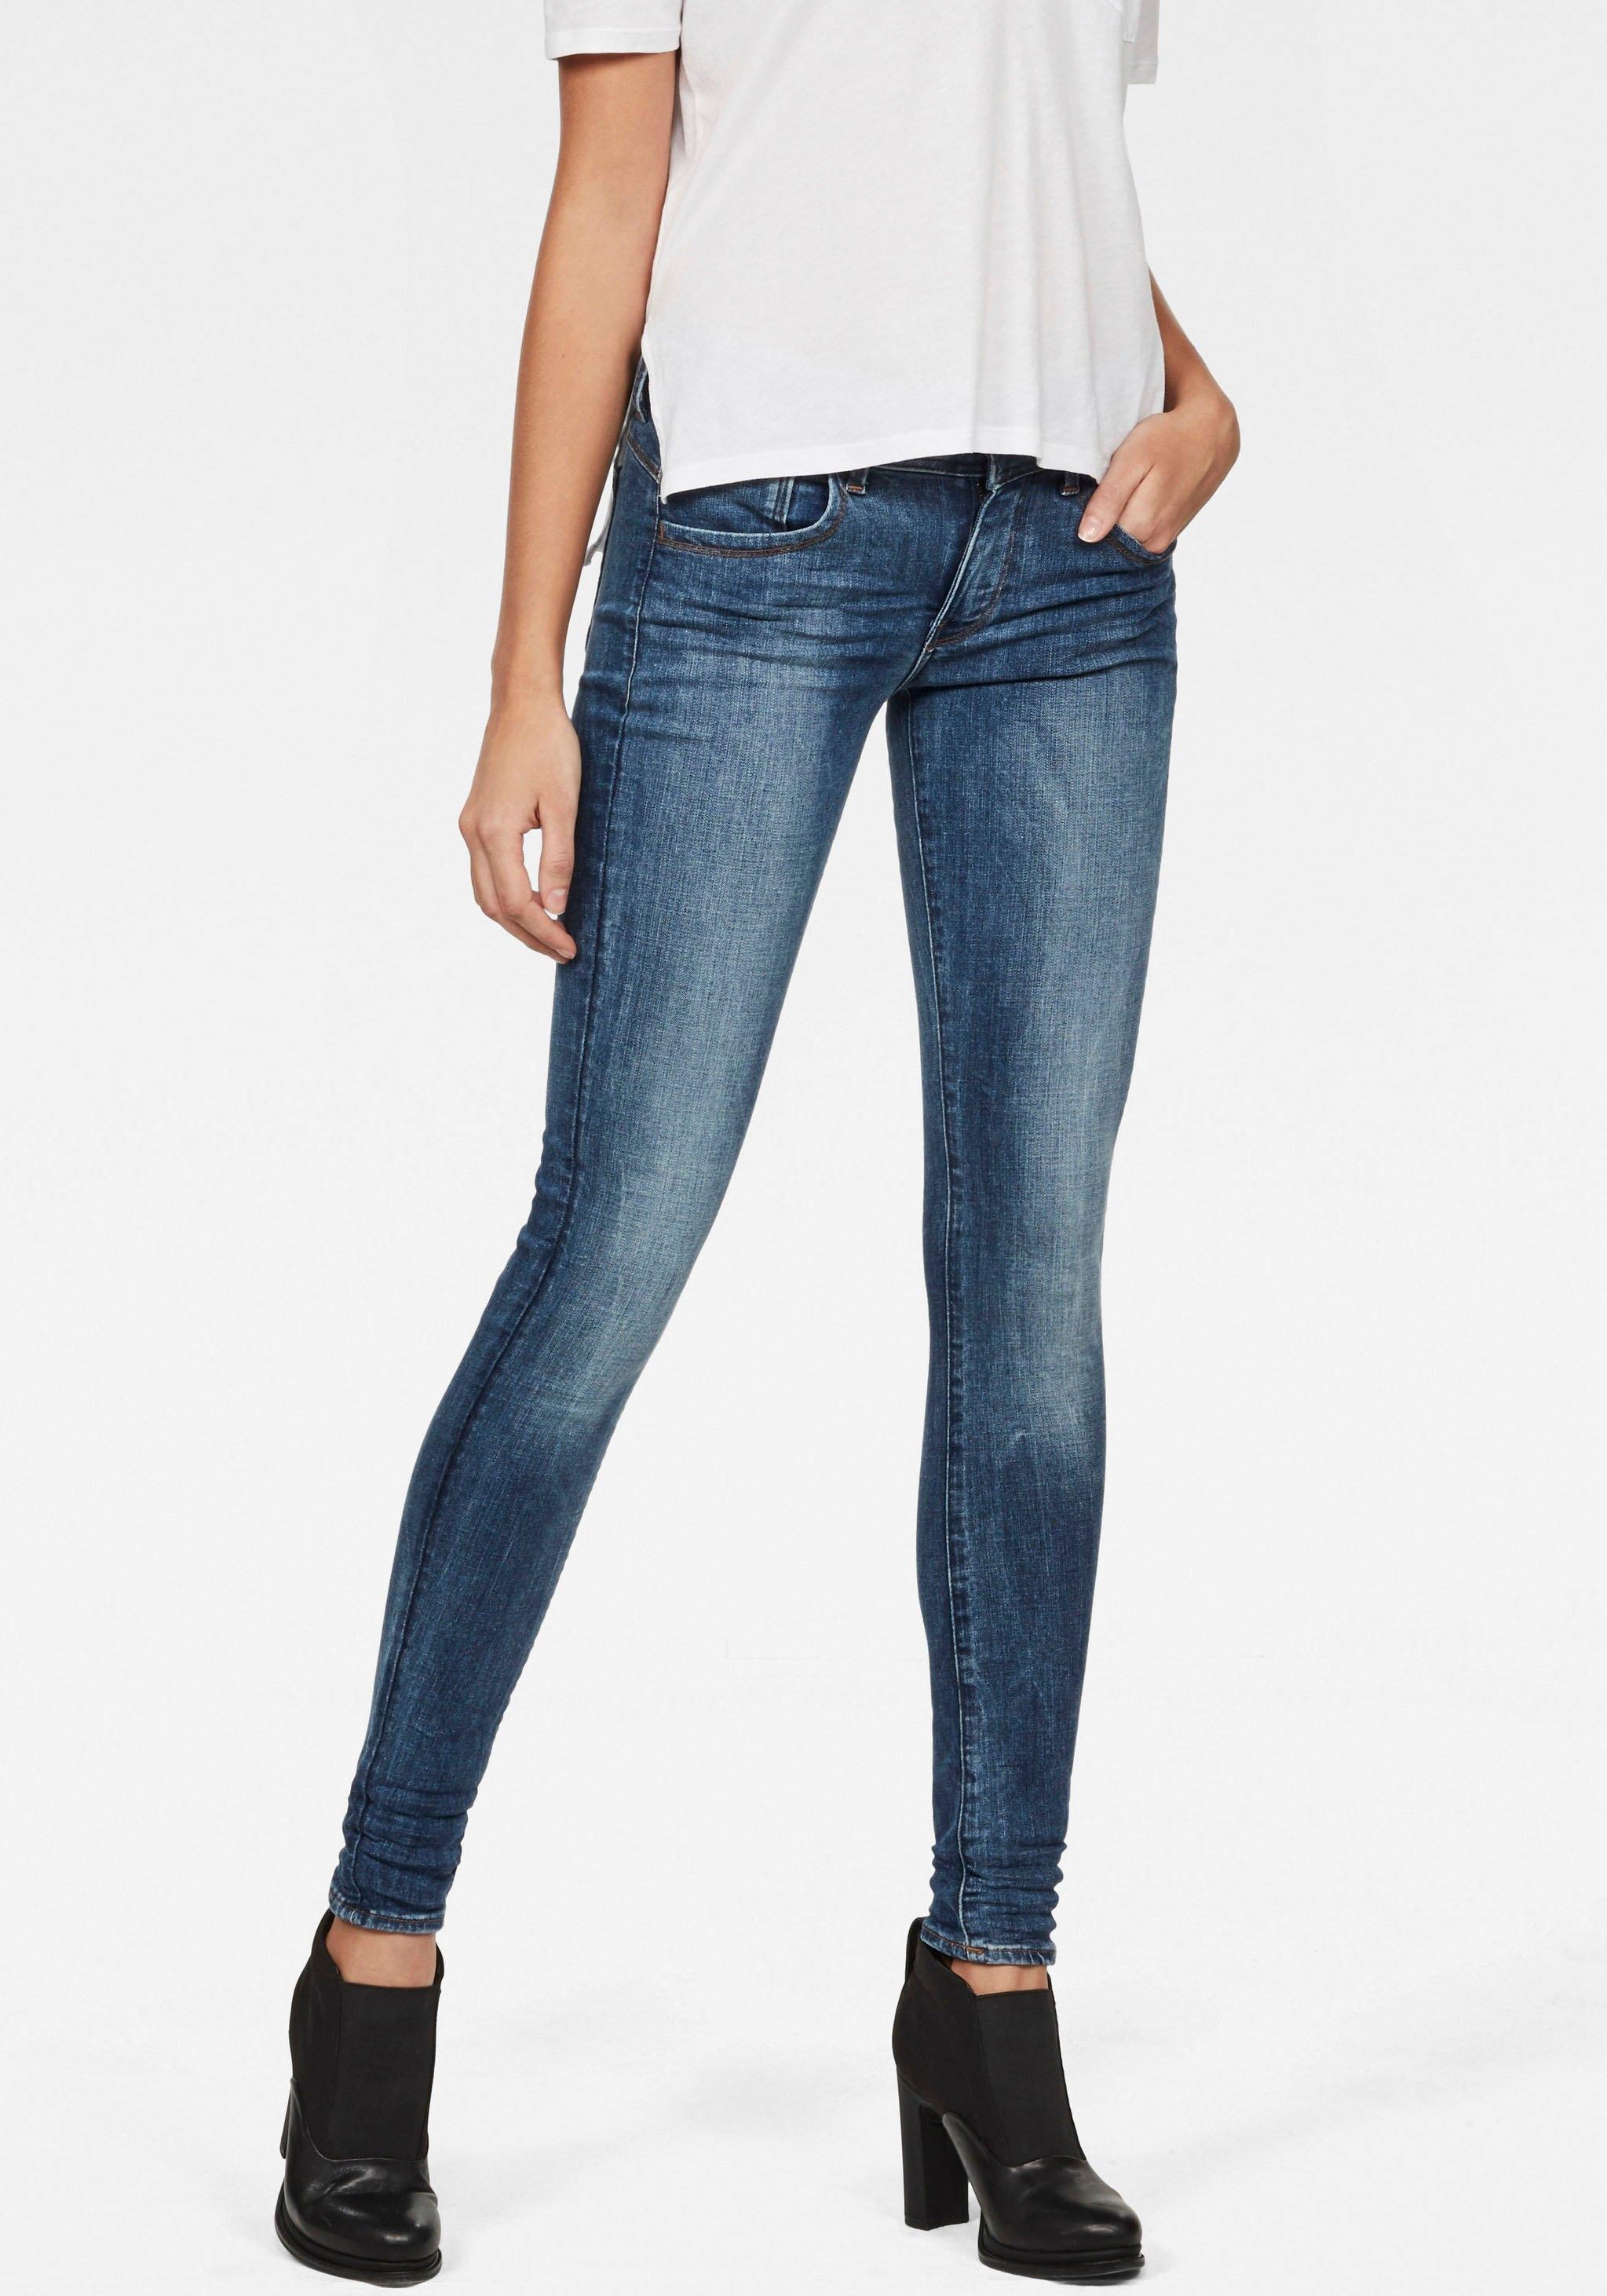 G-Star RAW skinny fit jeans Lynn D-Mid Waist Super Skinny elegante variant van de klassieke 5-pocket jeans - verschillende betaalmethodes